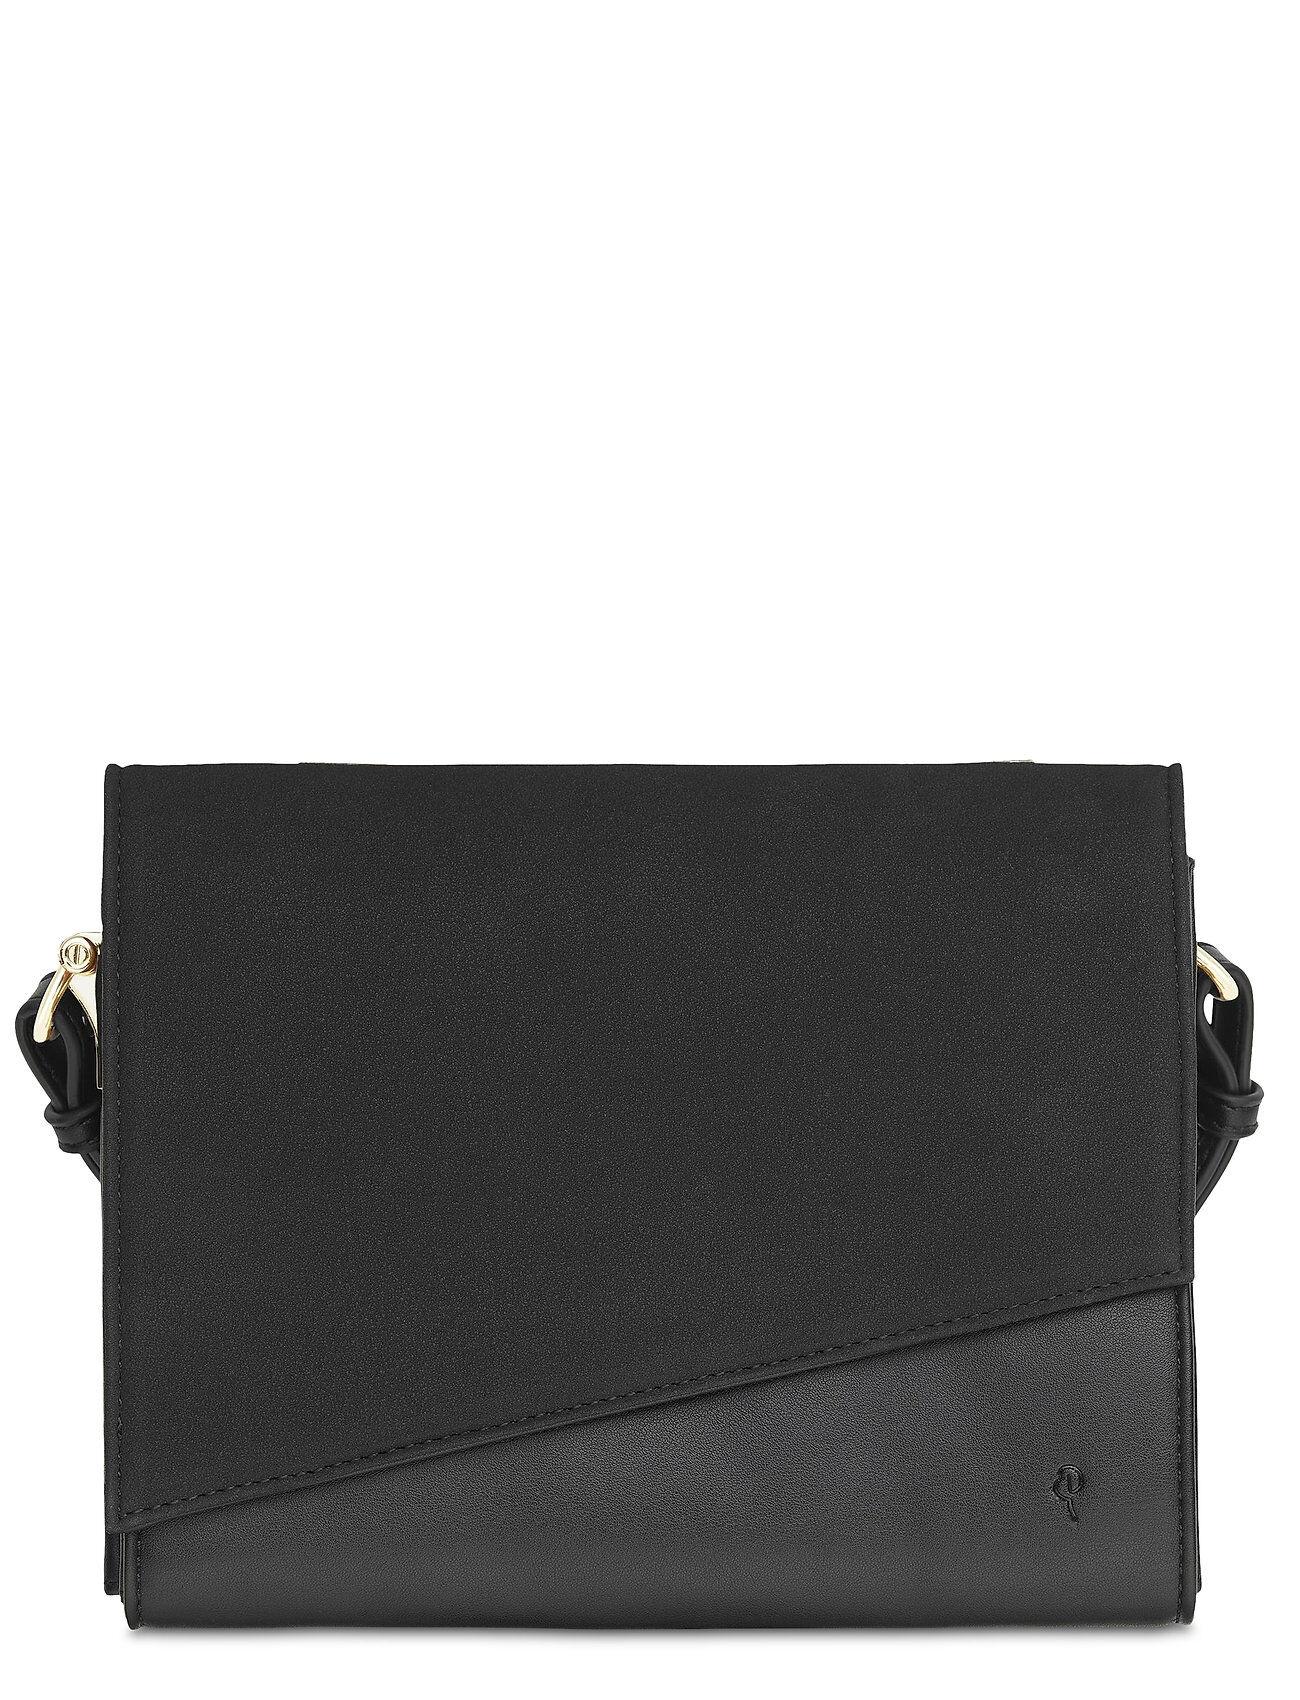 Edblad Cecil Crossbody Bag Black Bags Small Shoulder Bags - Crossbody Bags Musta Edblad